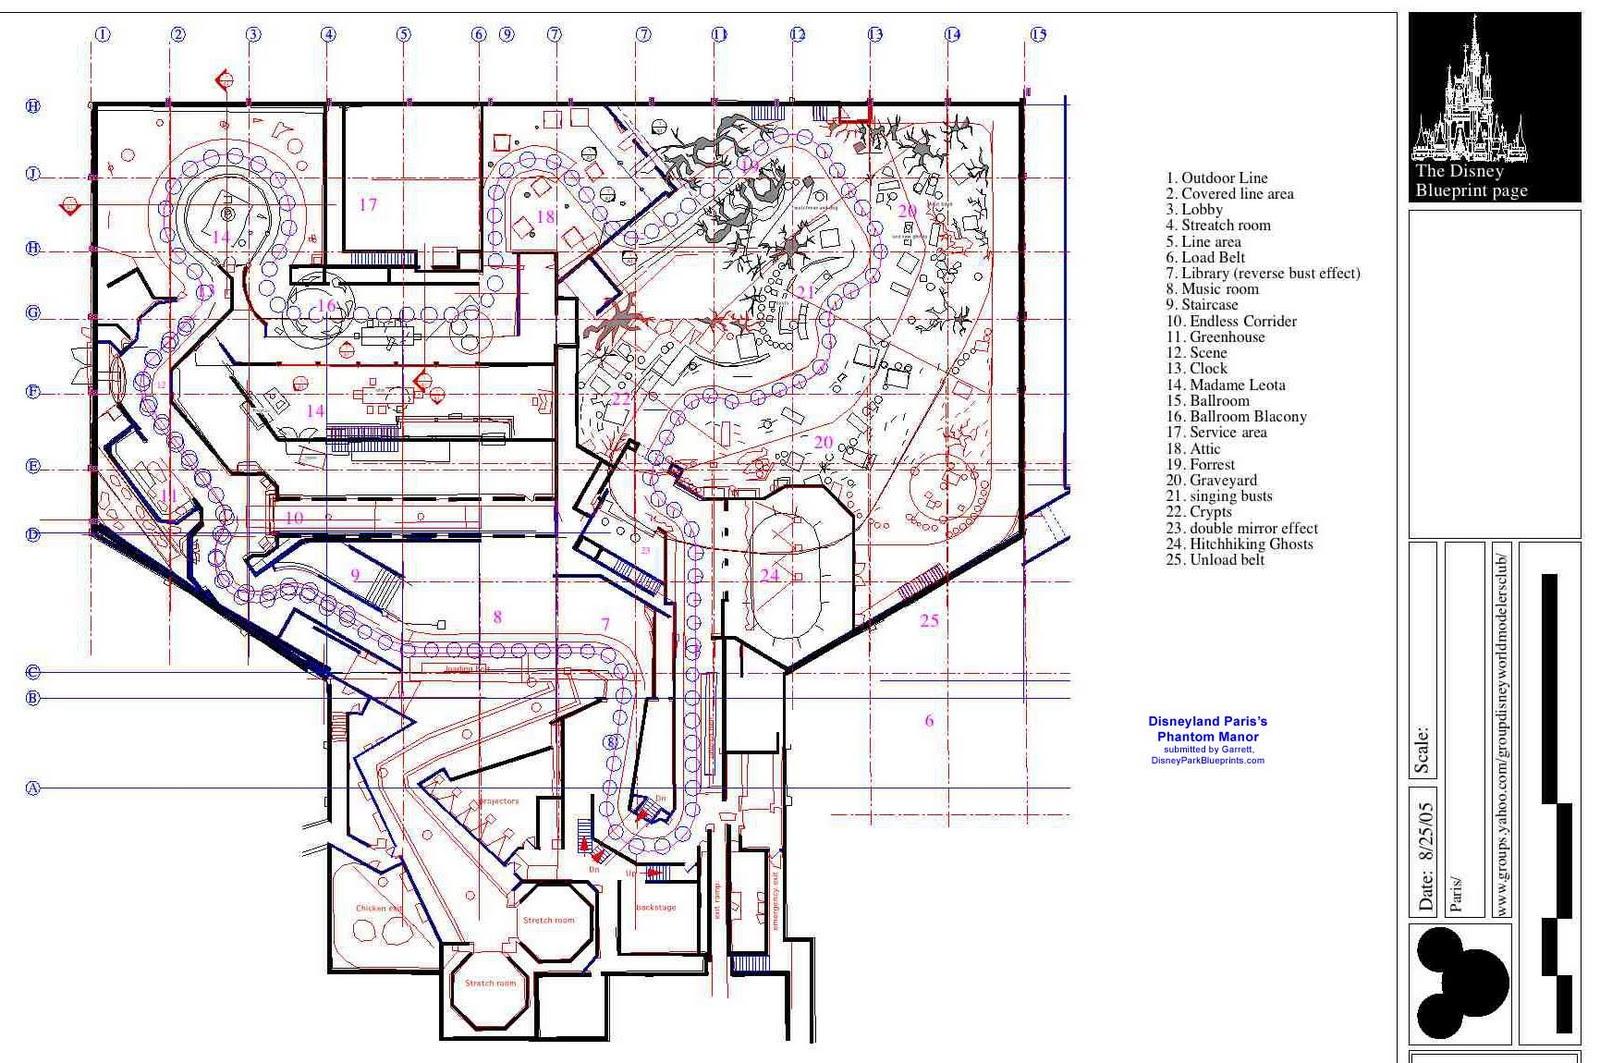 Disney Park Blueprints Phantom Manor Disneyland Paris